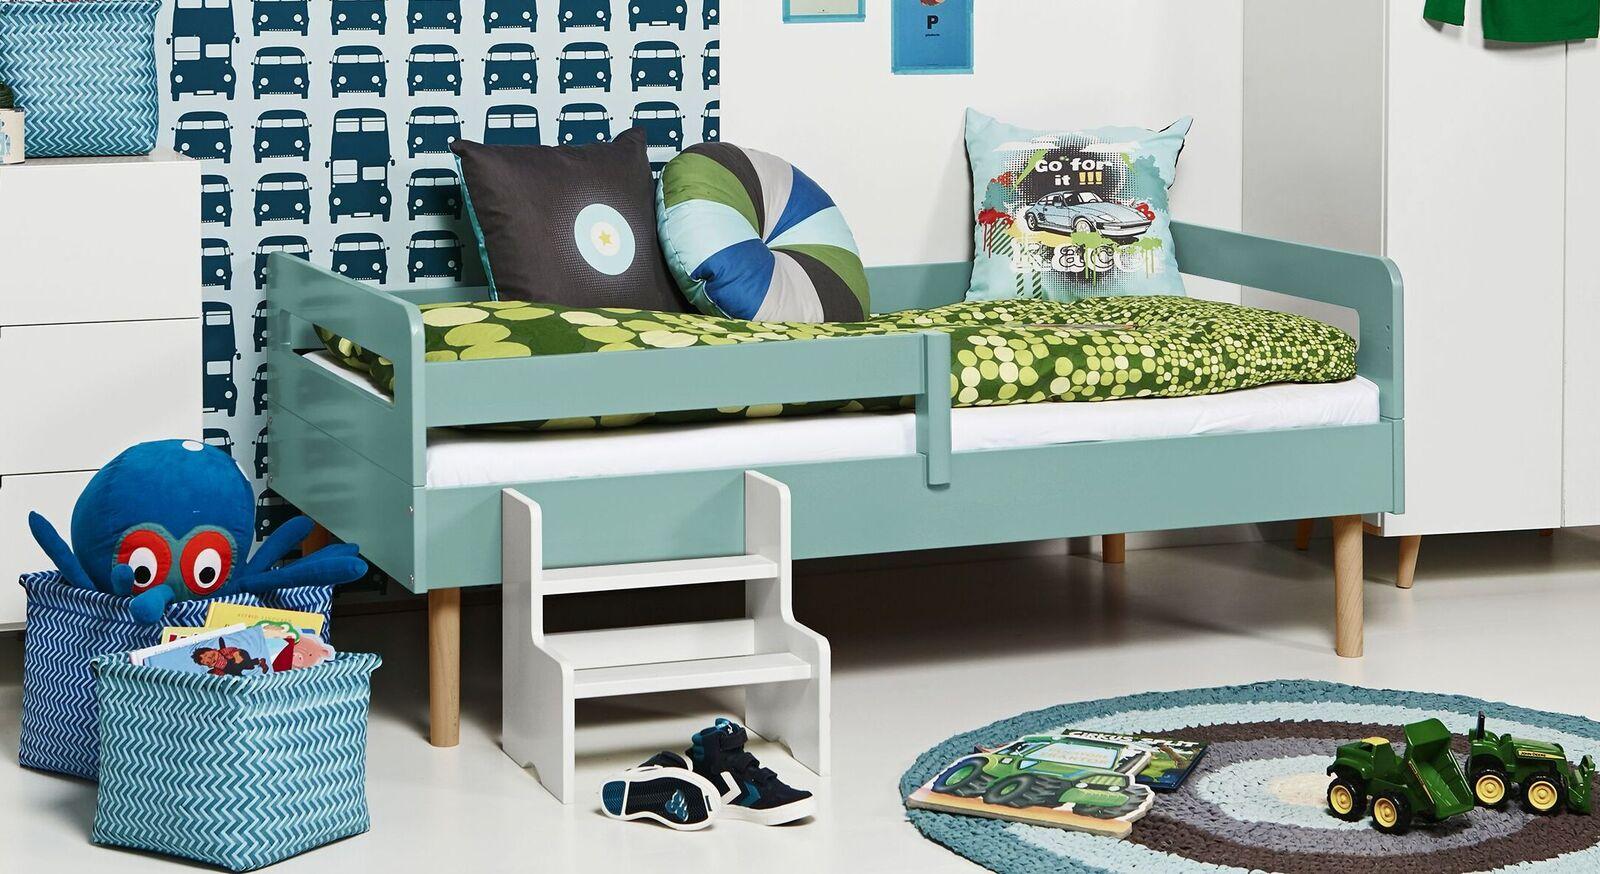 Modernes Kinderbett Kids Town Retro aus mintfarbenem MDF